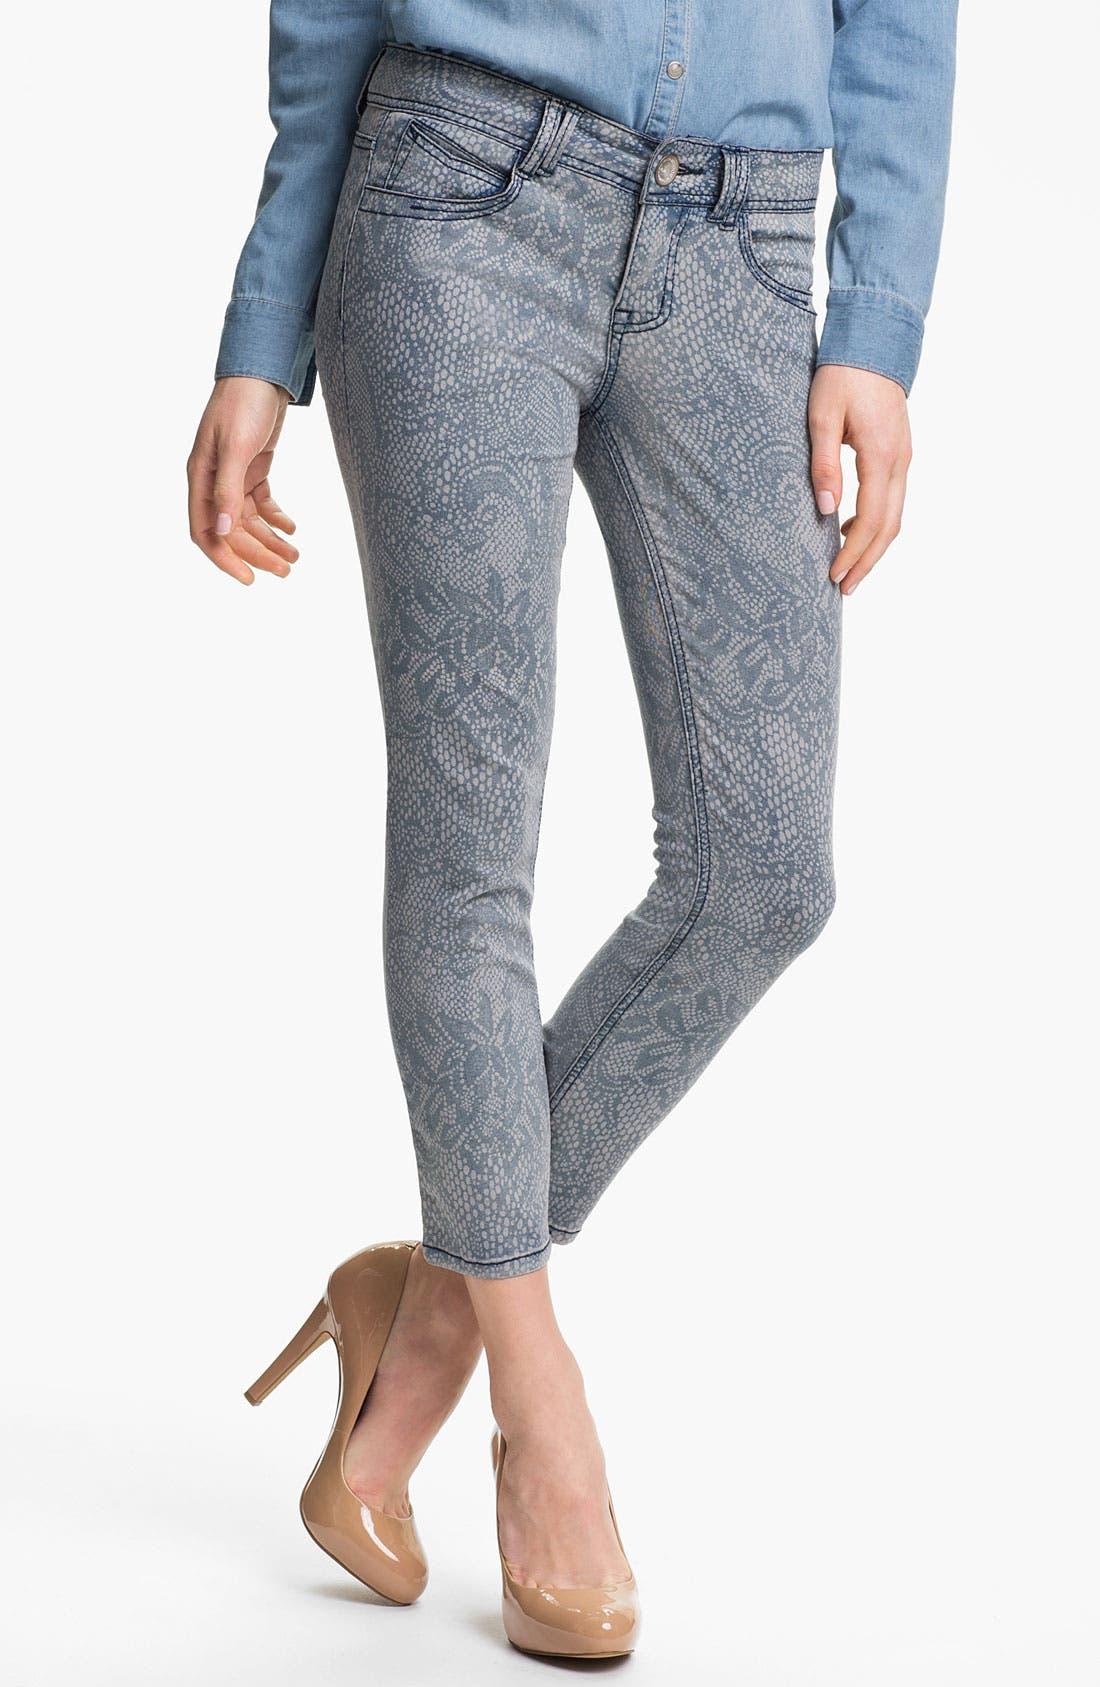 Main Image - Wit & Wisdom Lace Print Crop Jeans (Indigo) (Nordstrom Exclusive)